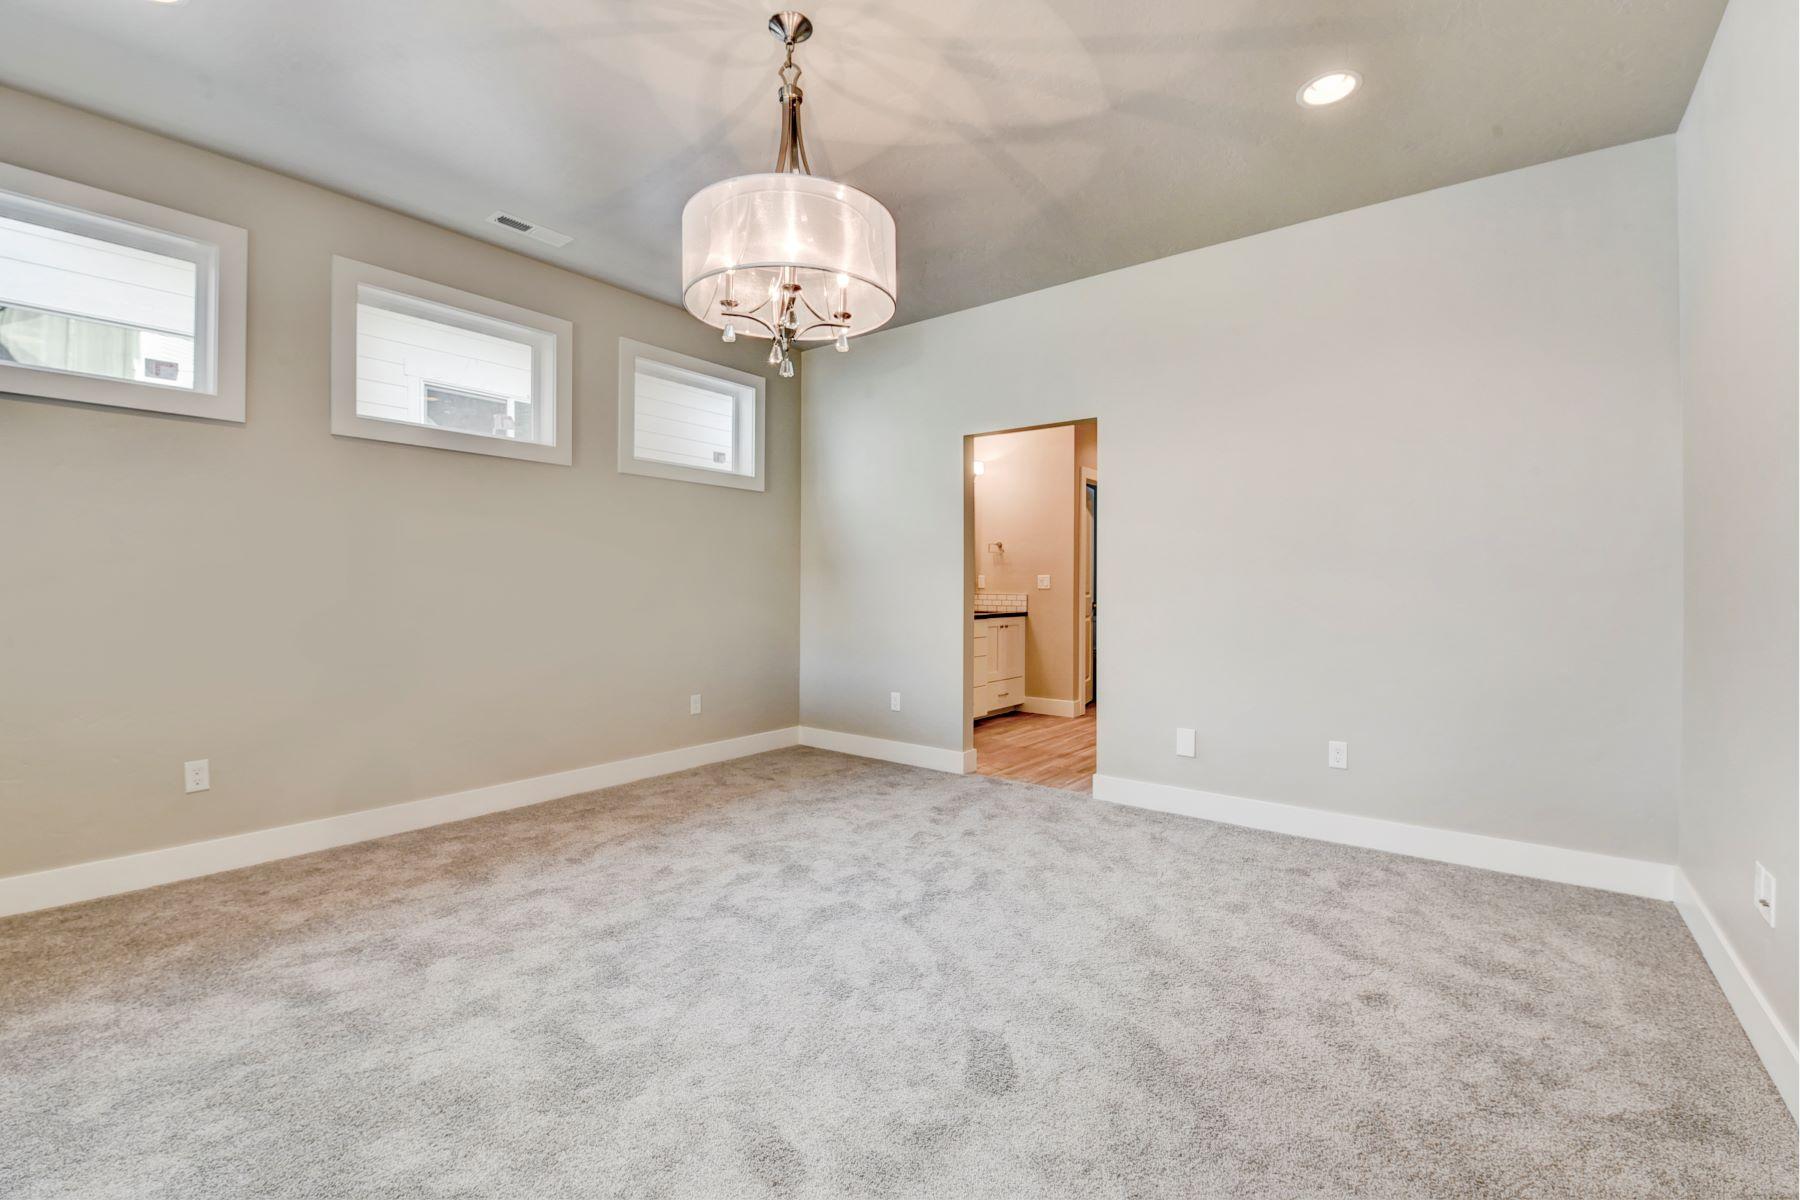 Additional photo for property listing at 4299 Farm View Dr, Boise 4299 W Farm View Dr Boise, Idaho 83714